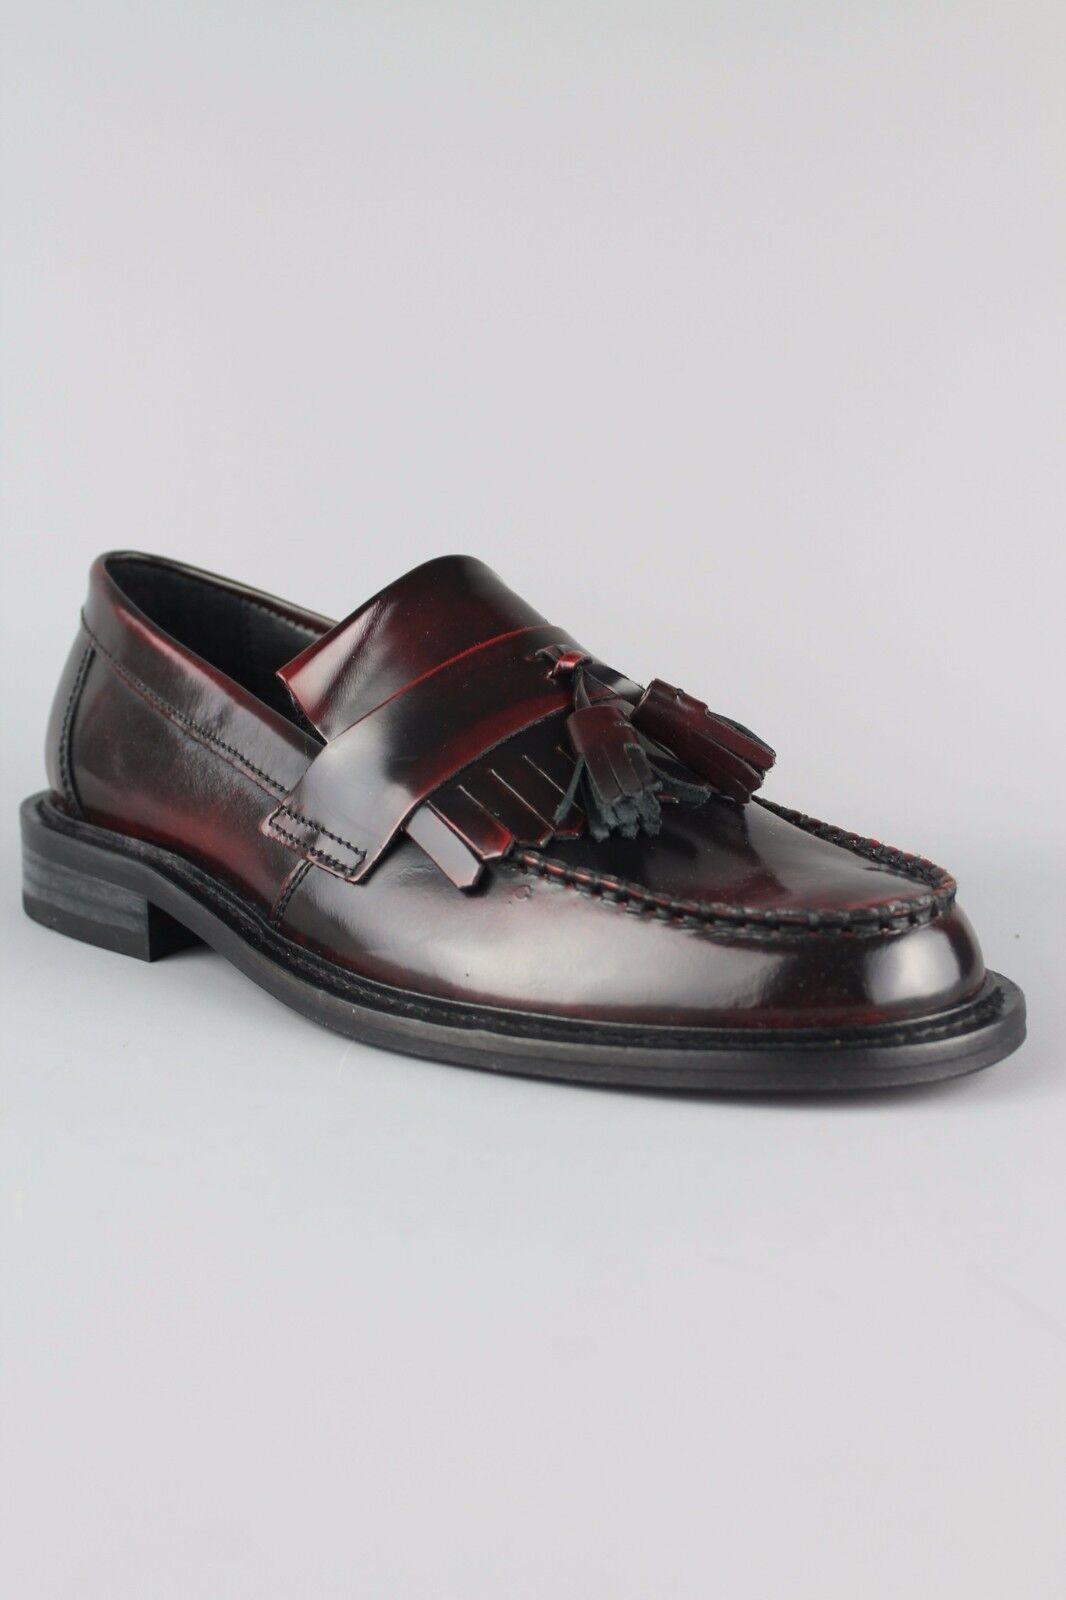 Ikon Selecta Ik3235  Mens schuhe rot Polished Leather Mocassin Tassel Loafers